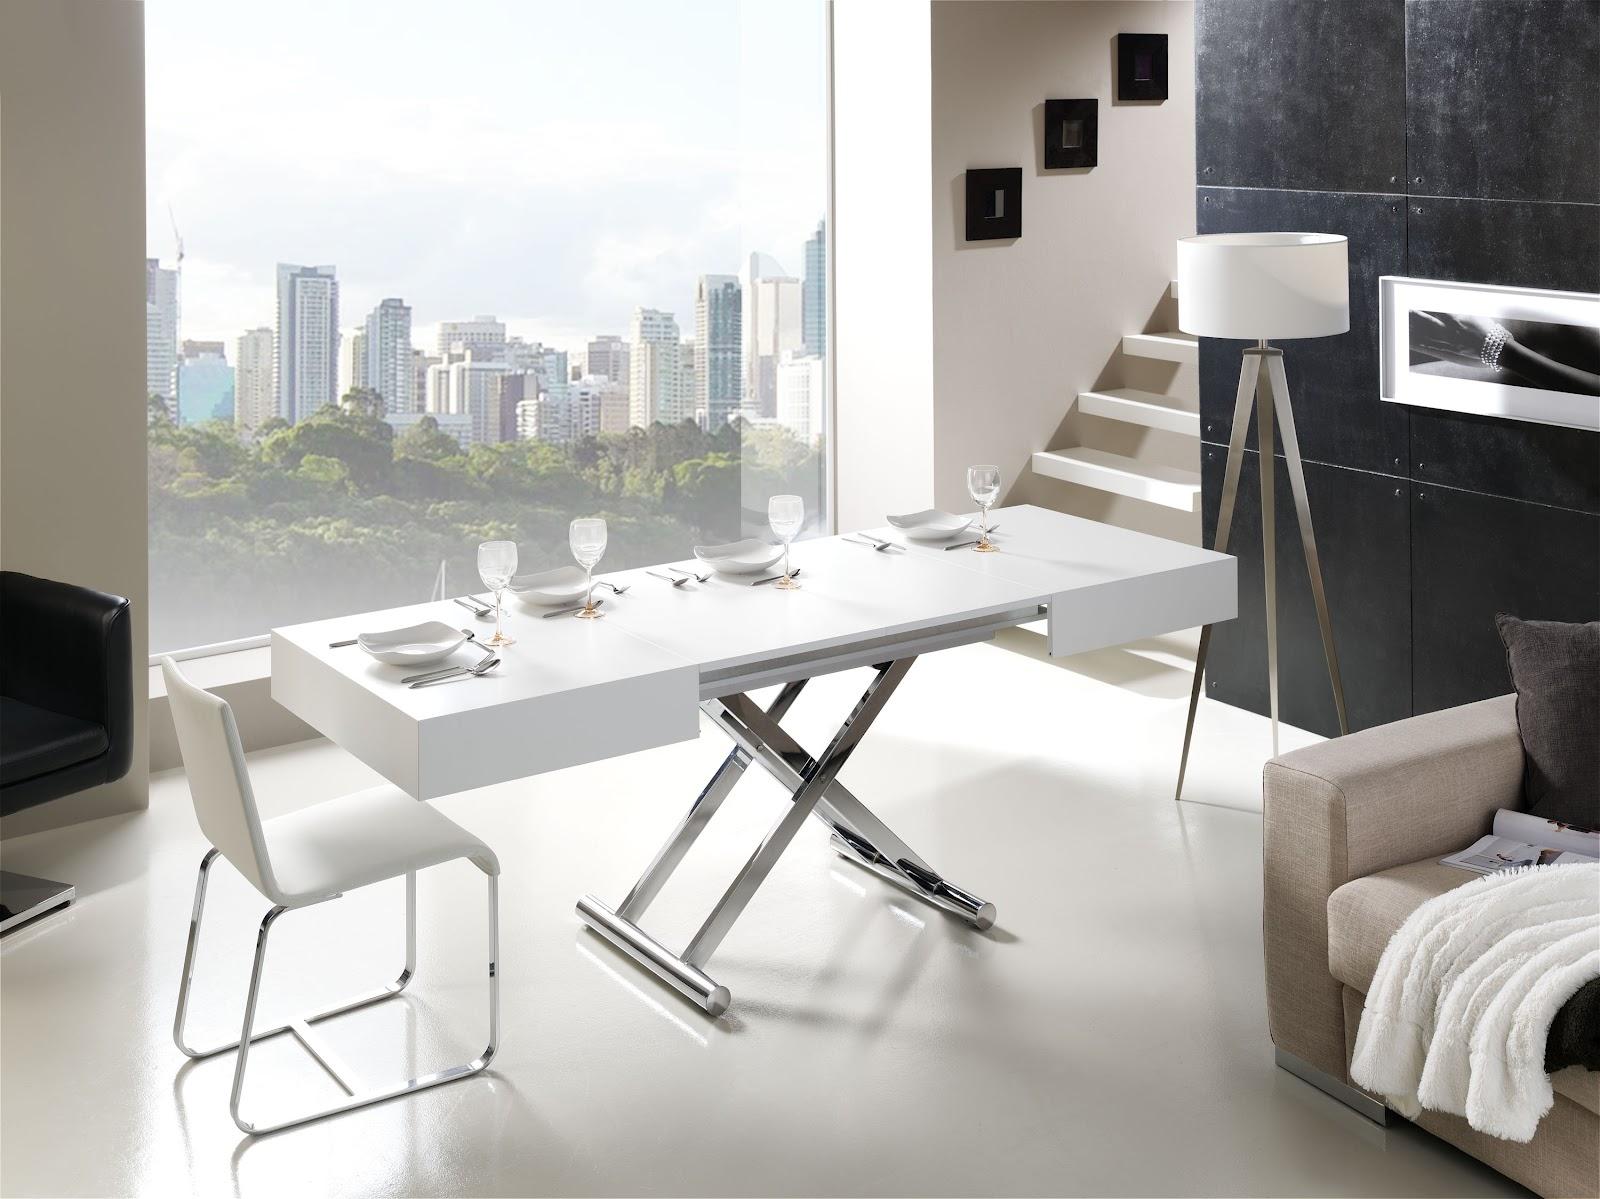 Mesas de centro elevables y extensibles a mesas de comedor for Mesa comedor transformable